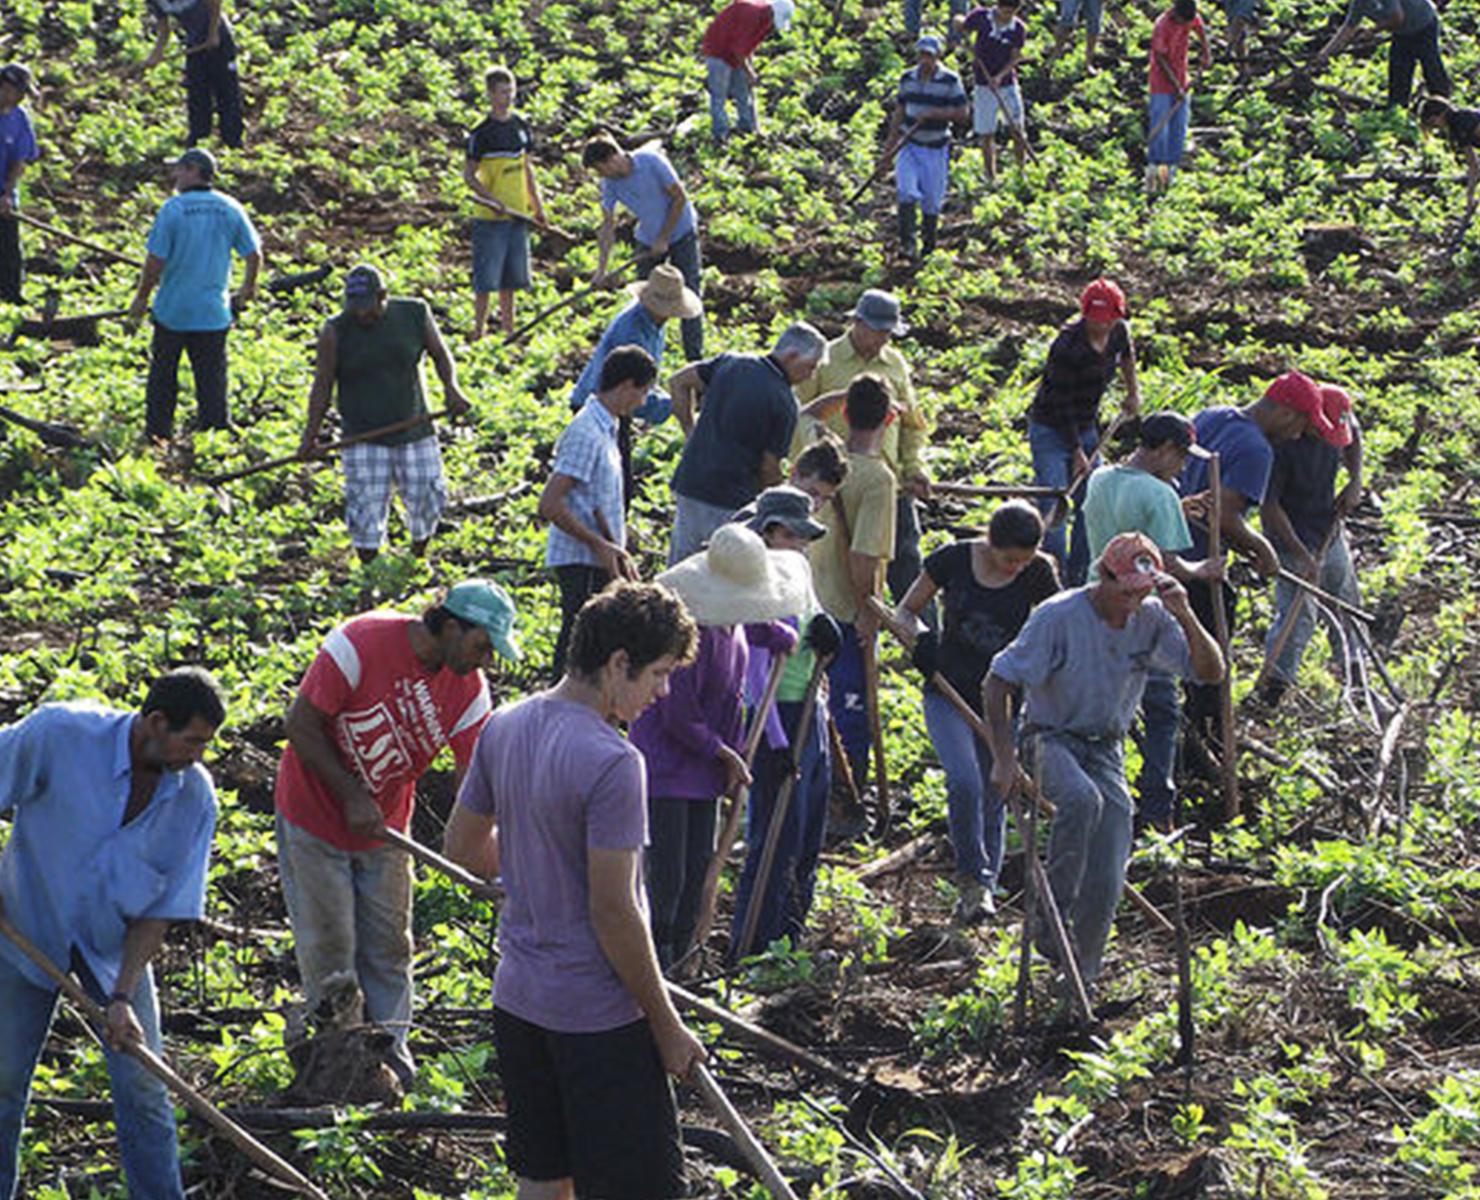 BRASIL: GOVERNO SUSPENDE REFORMA AGRÁRIA